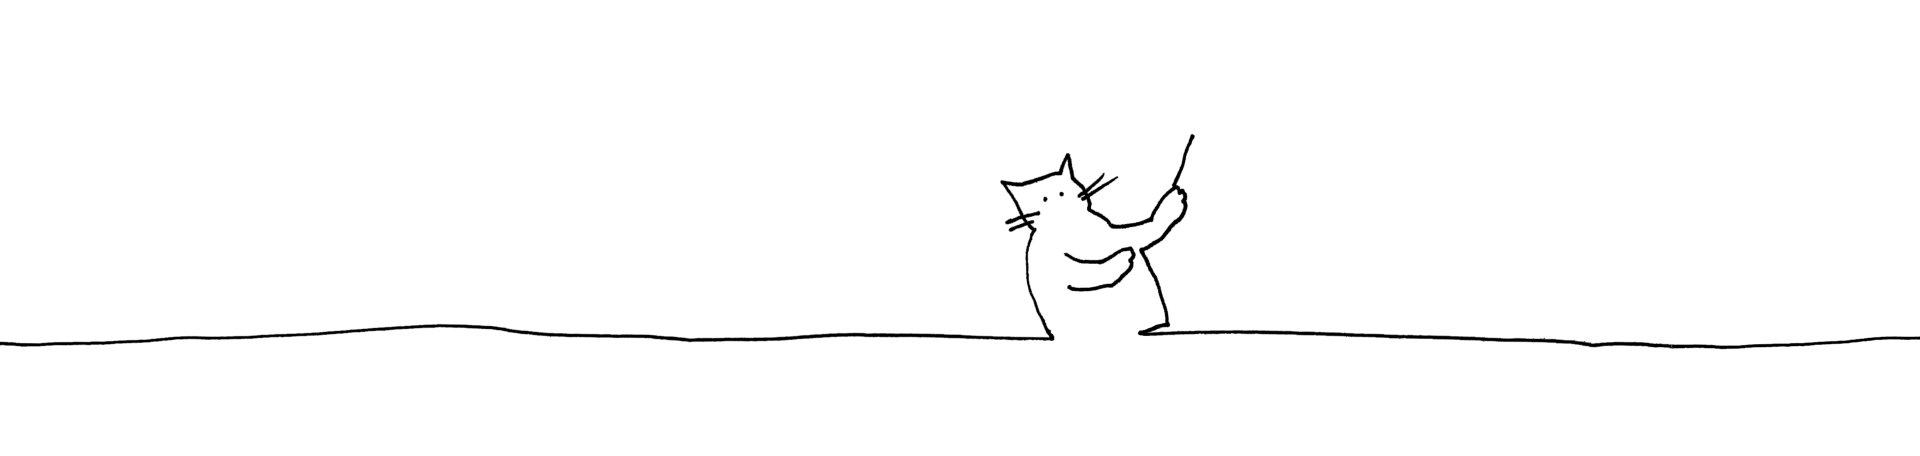 kitty music l